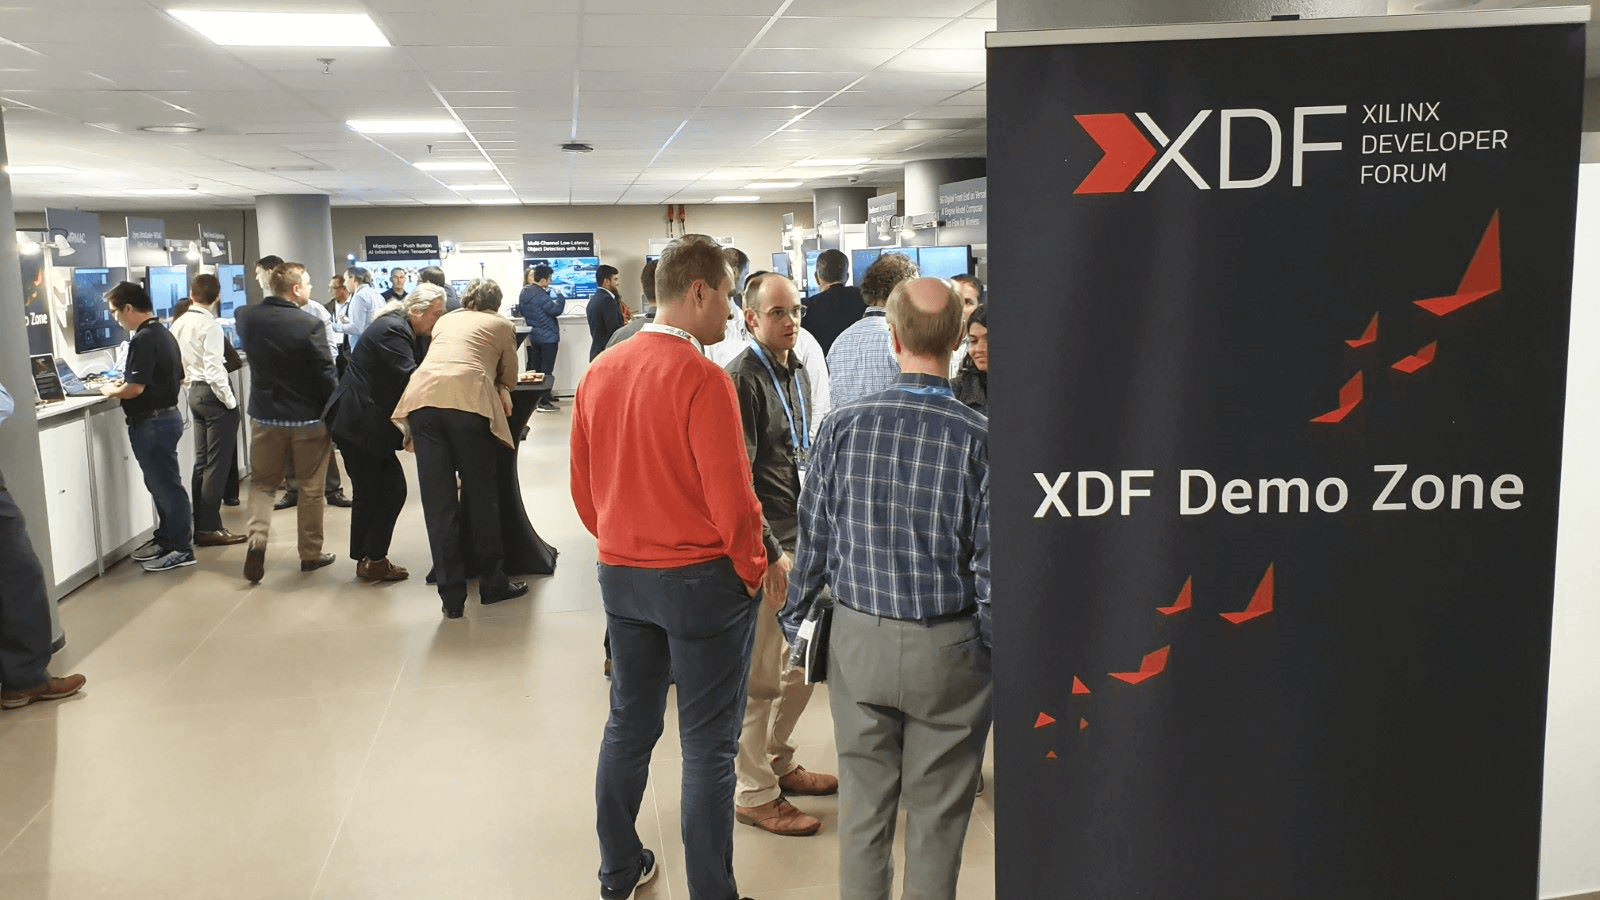 Demo zone at XDF